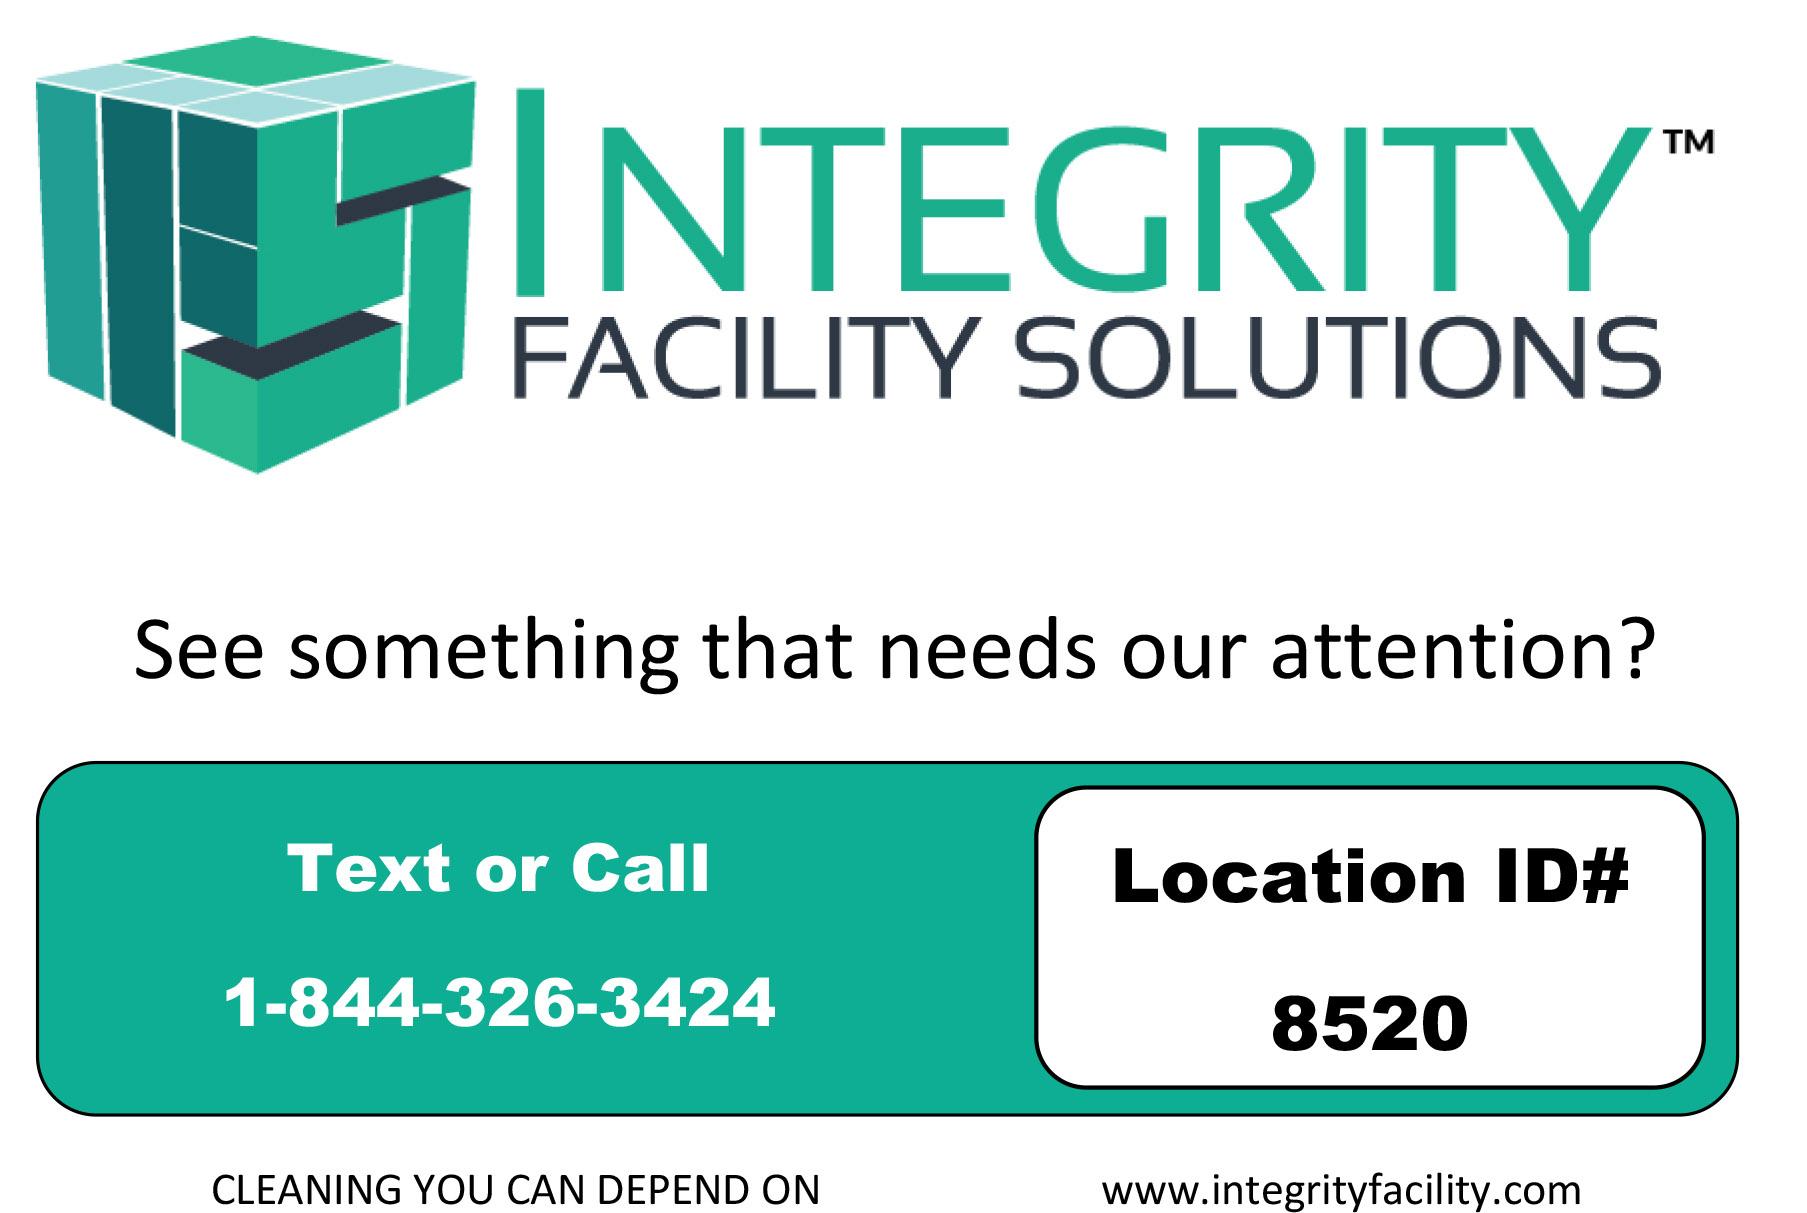 Integrity Facility Solutions Survey Plaque